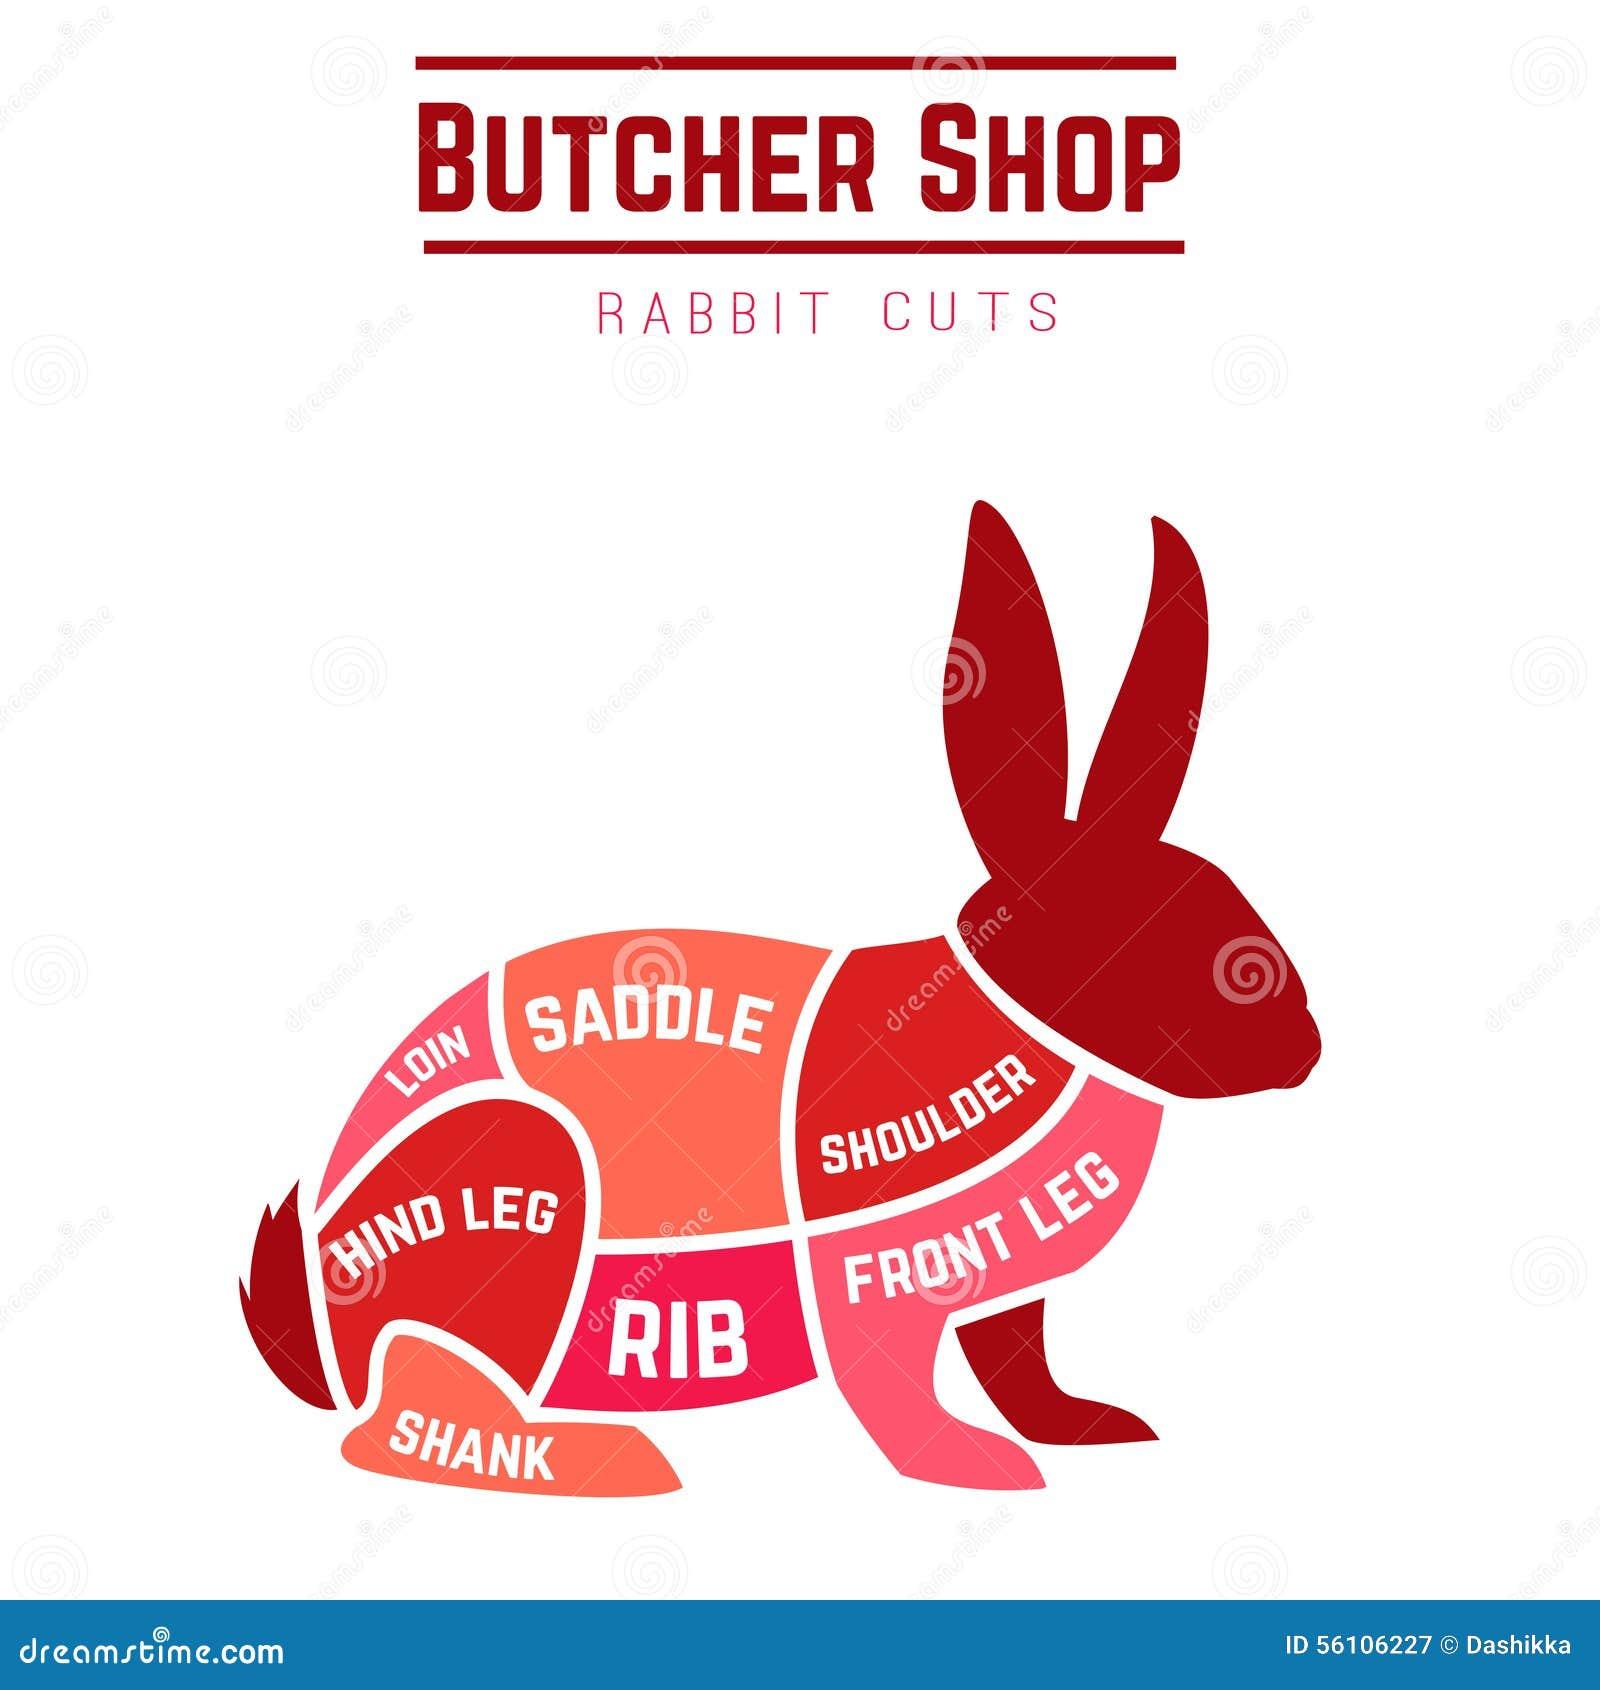 rabbit cuts diagram butcher shop vector illustration 56106227 diagram of moose cuts best wiring library